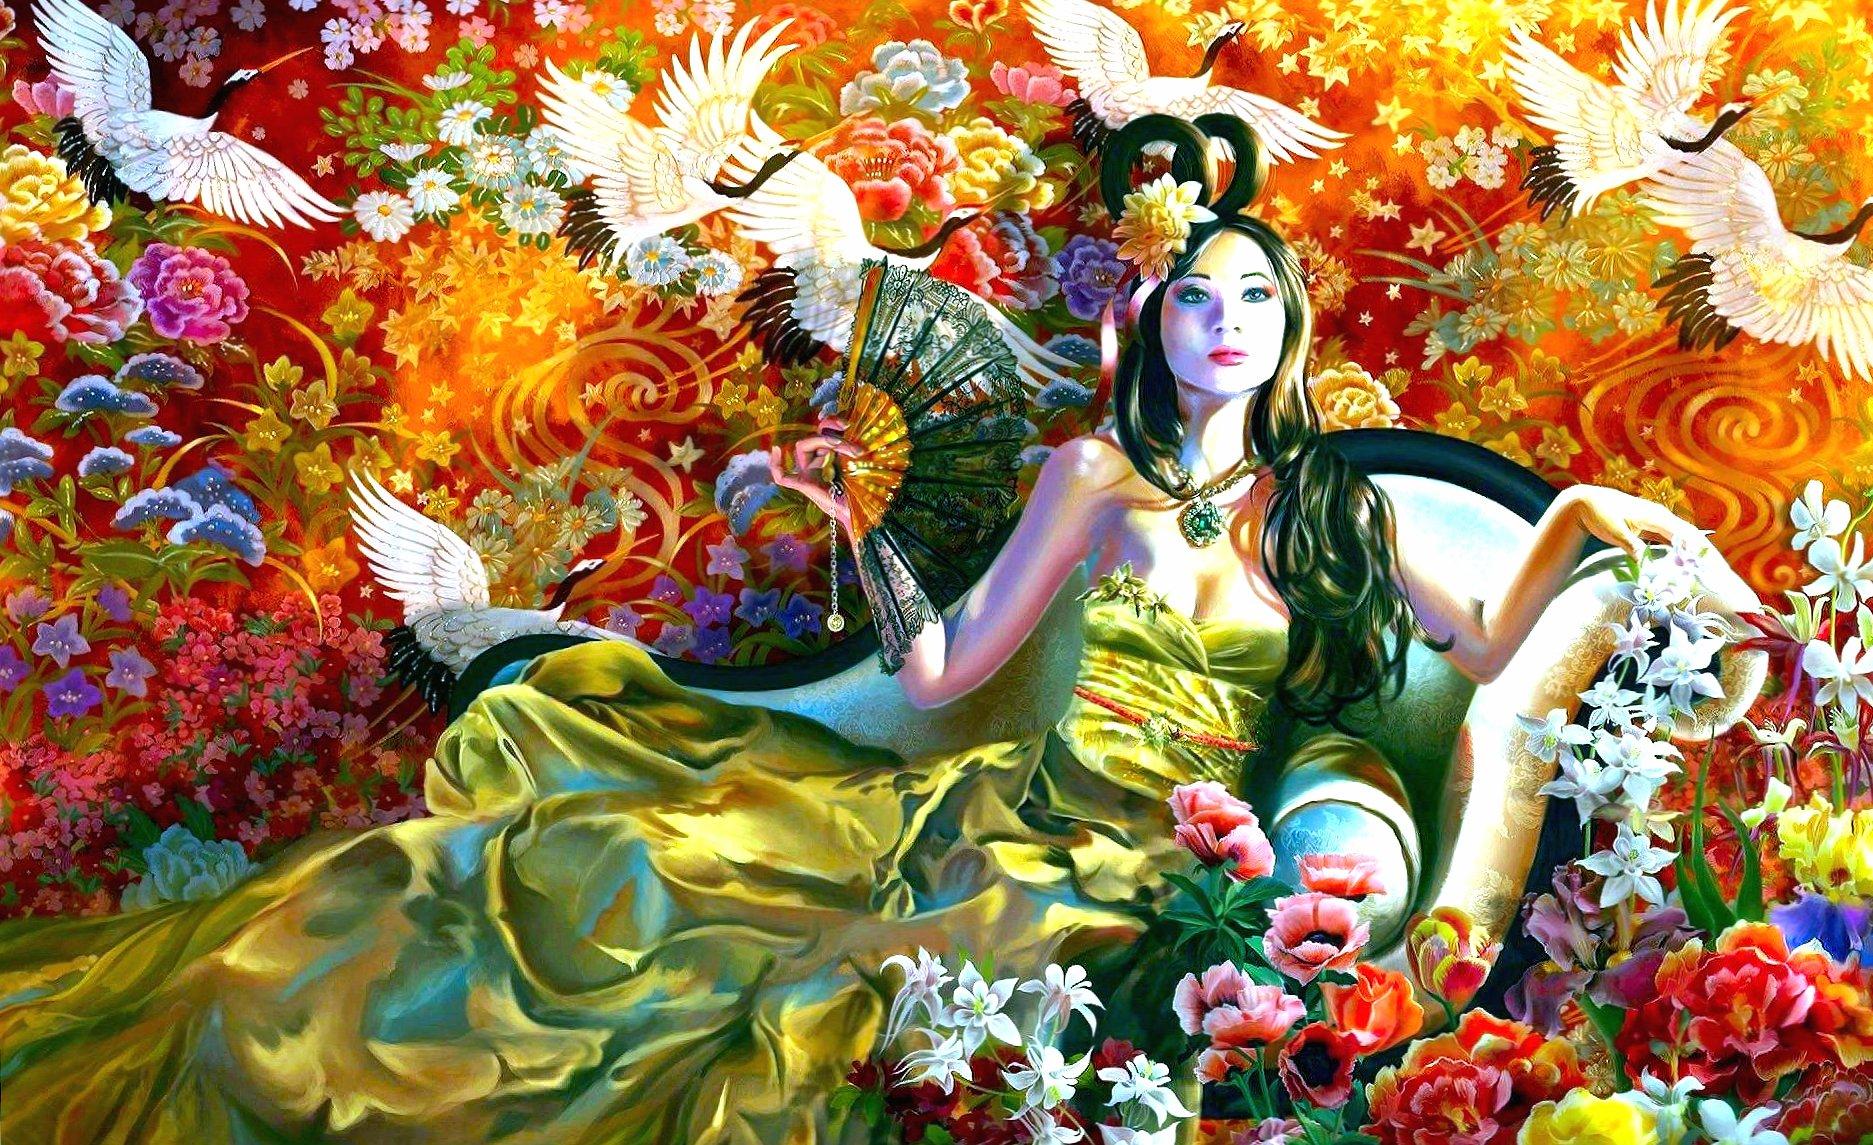 amazing oriental fantasy art wallpapers HD quality